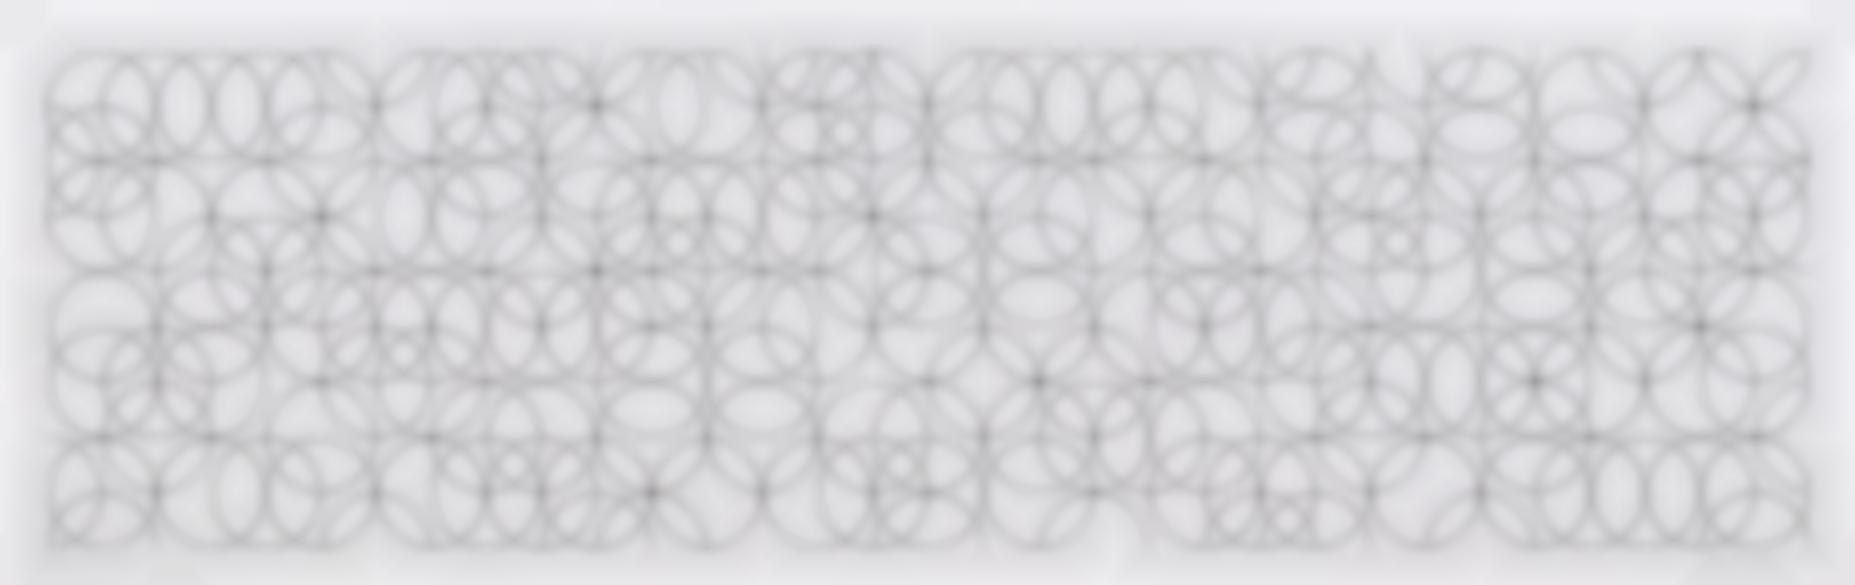 Bridget Riley-Composition With Circles 2-2001